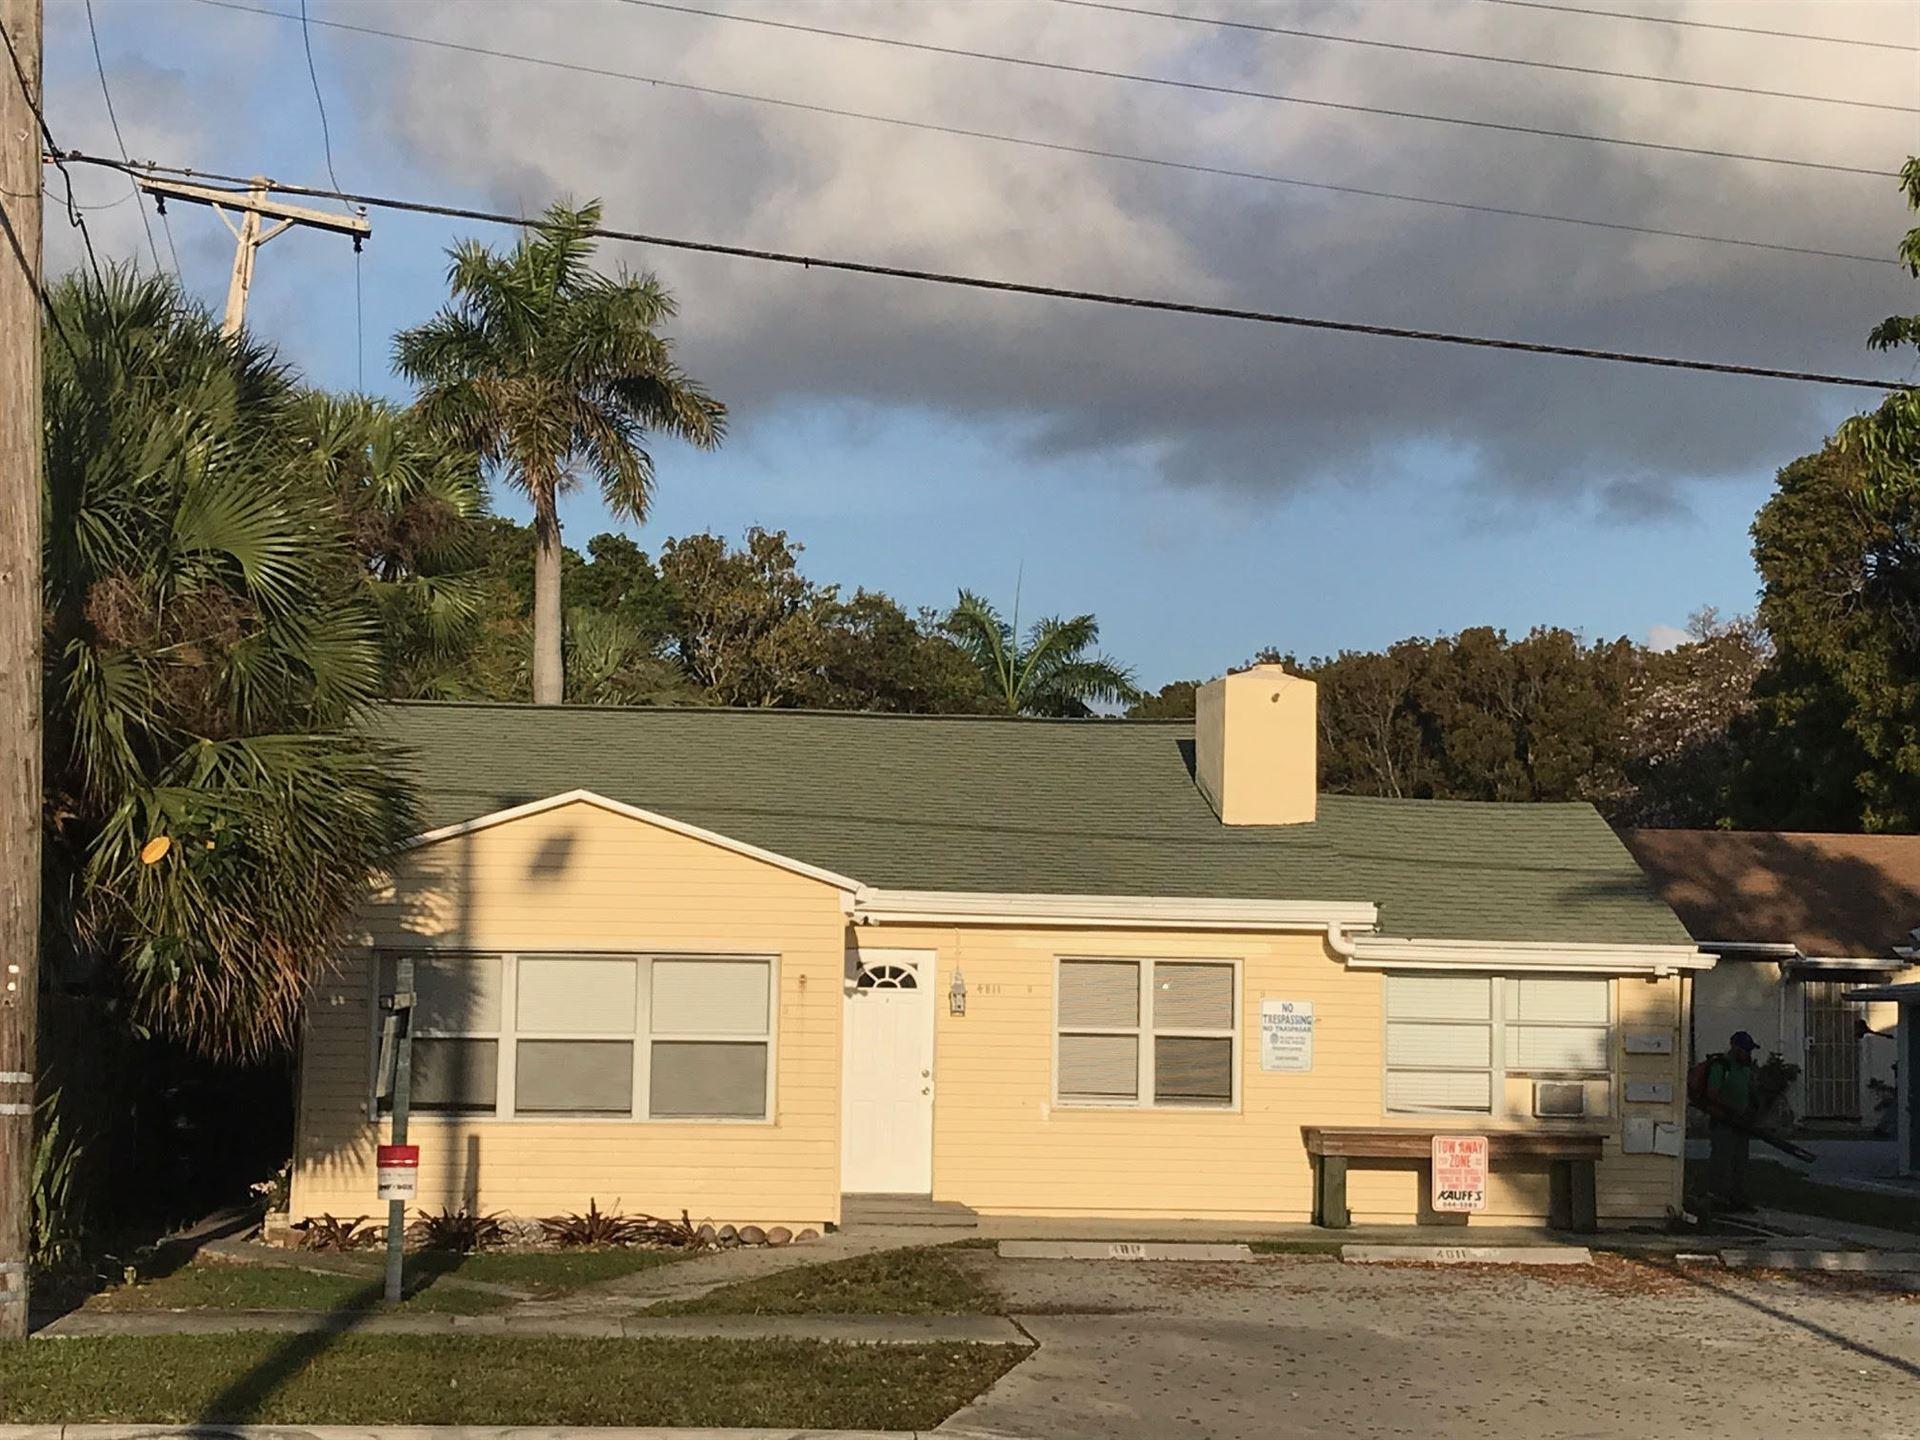 4811 N Flagler Drive, West Palm Beach, FL 33407 - #: RX-10611191